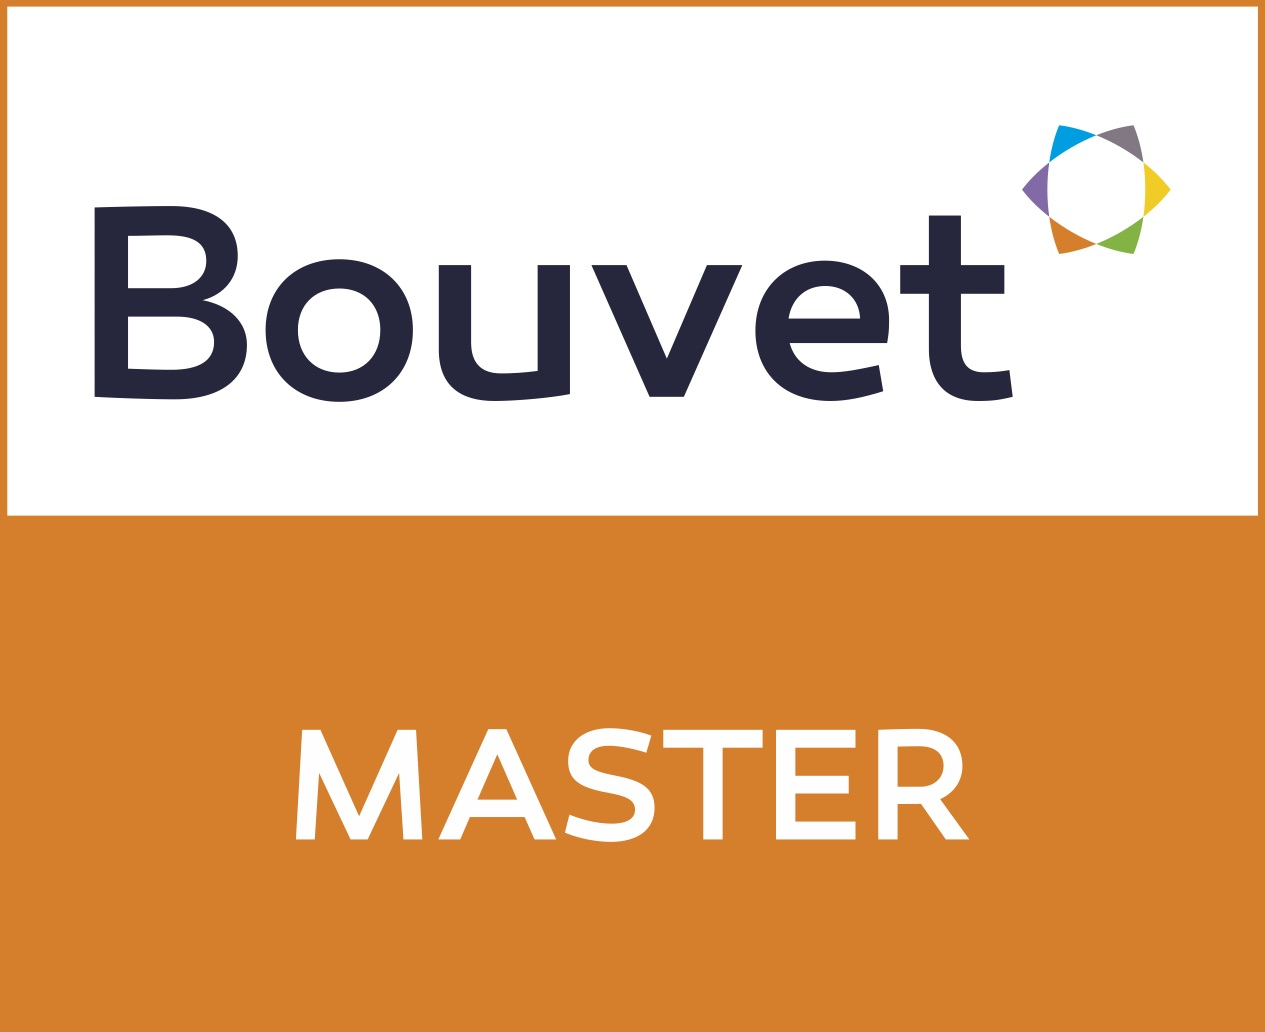 bouvet master logo